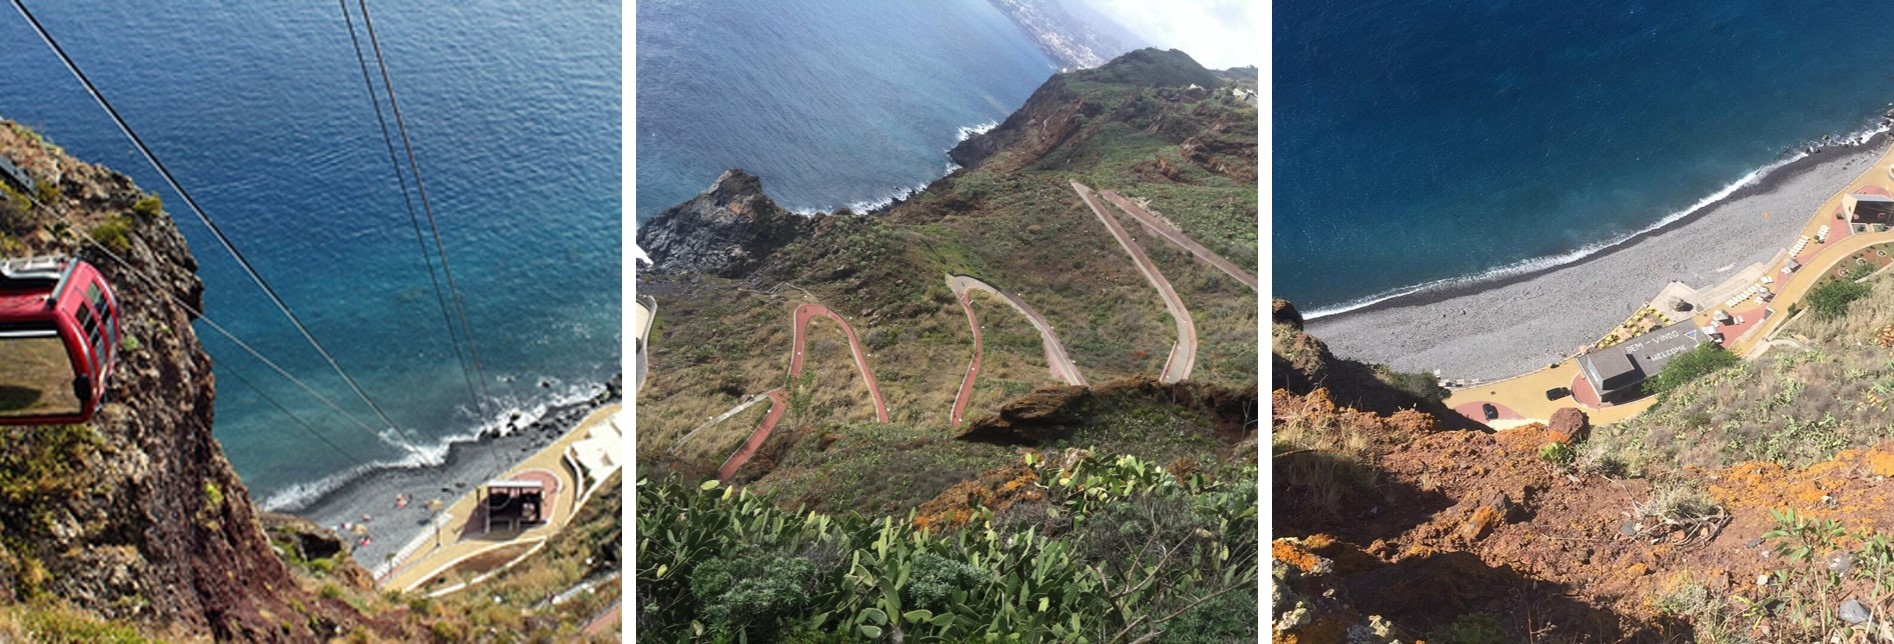 Cristo Rei Madeira Viewpoint Garajau Maeira Portugal